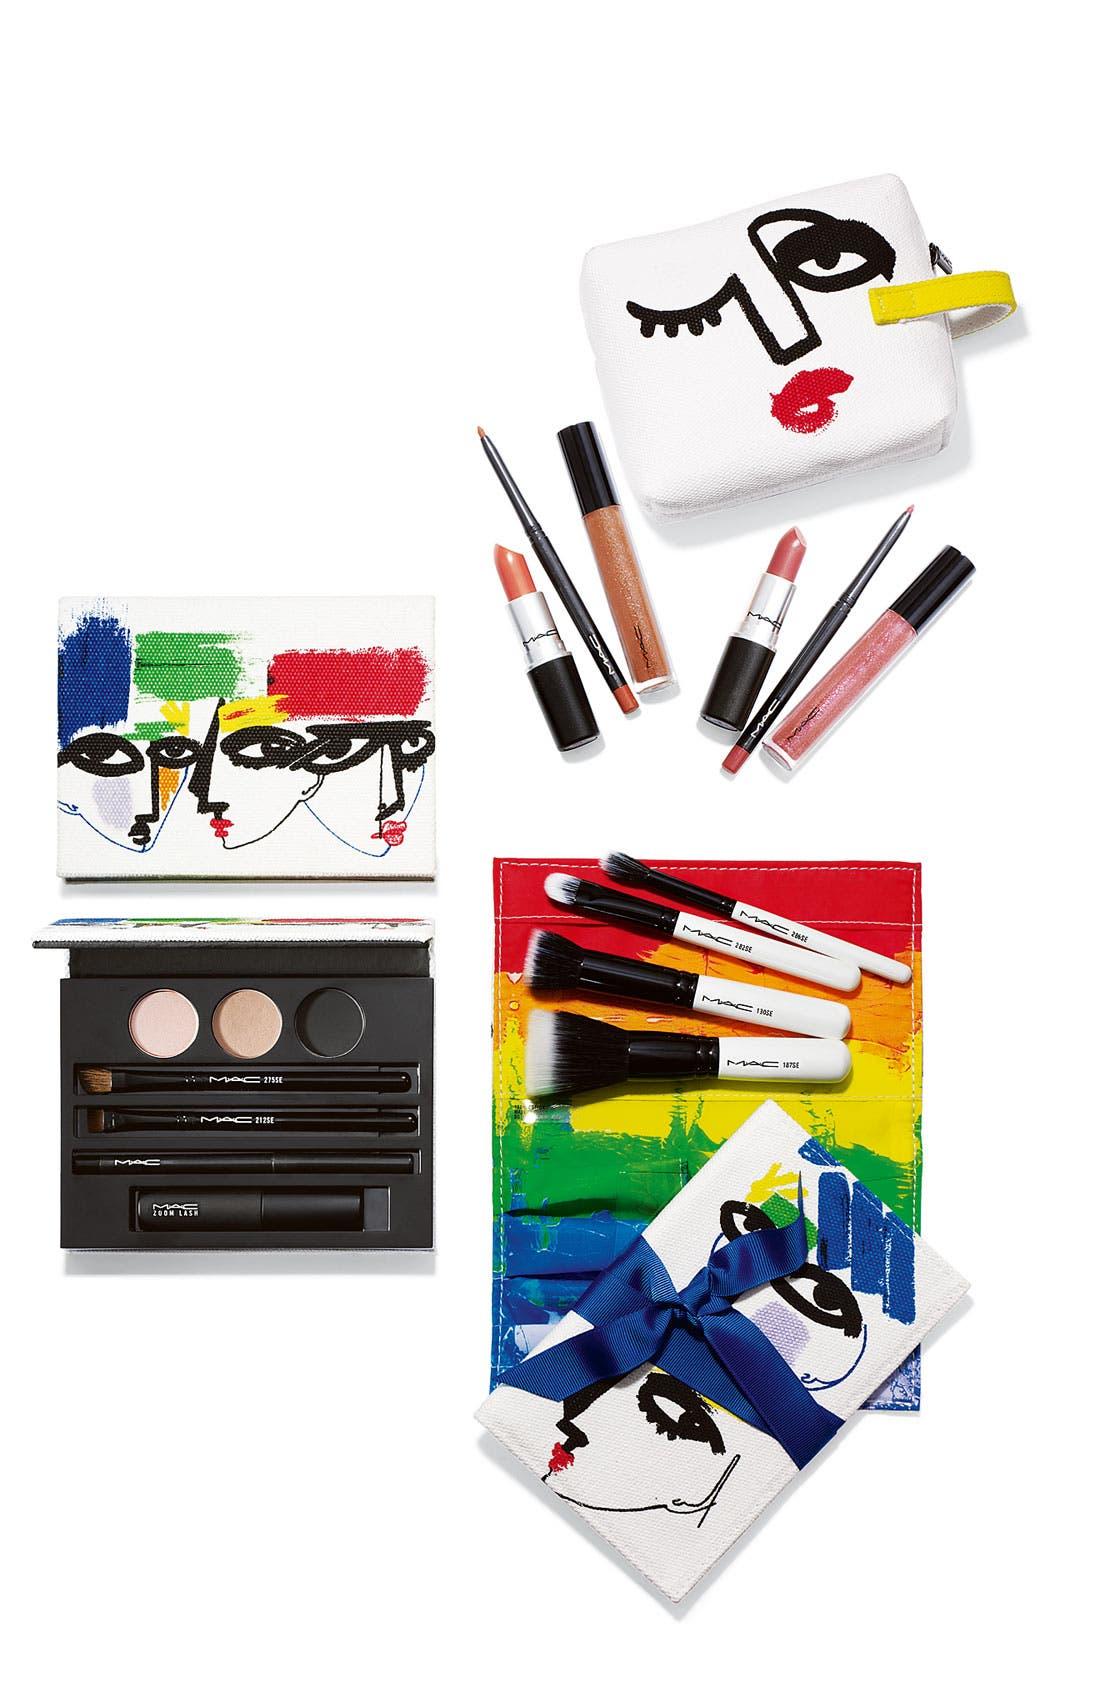 M·A·C 'Illustrated - Nude x3' Lip Color & Bag by Julie Verhoeven,                             Alternate thumbnail 2, color,                             000